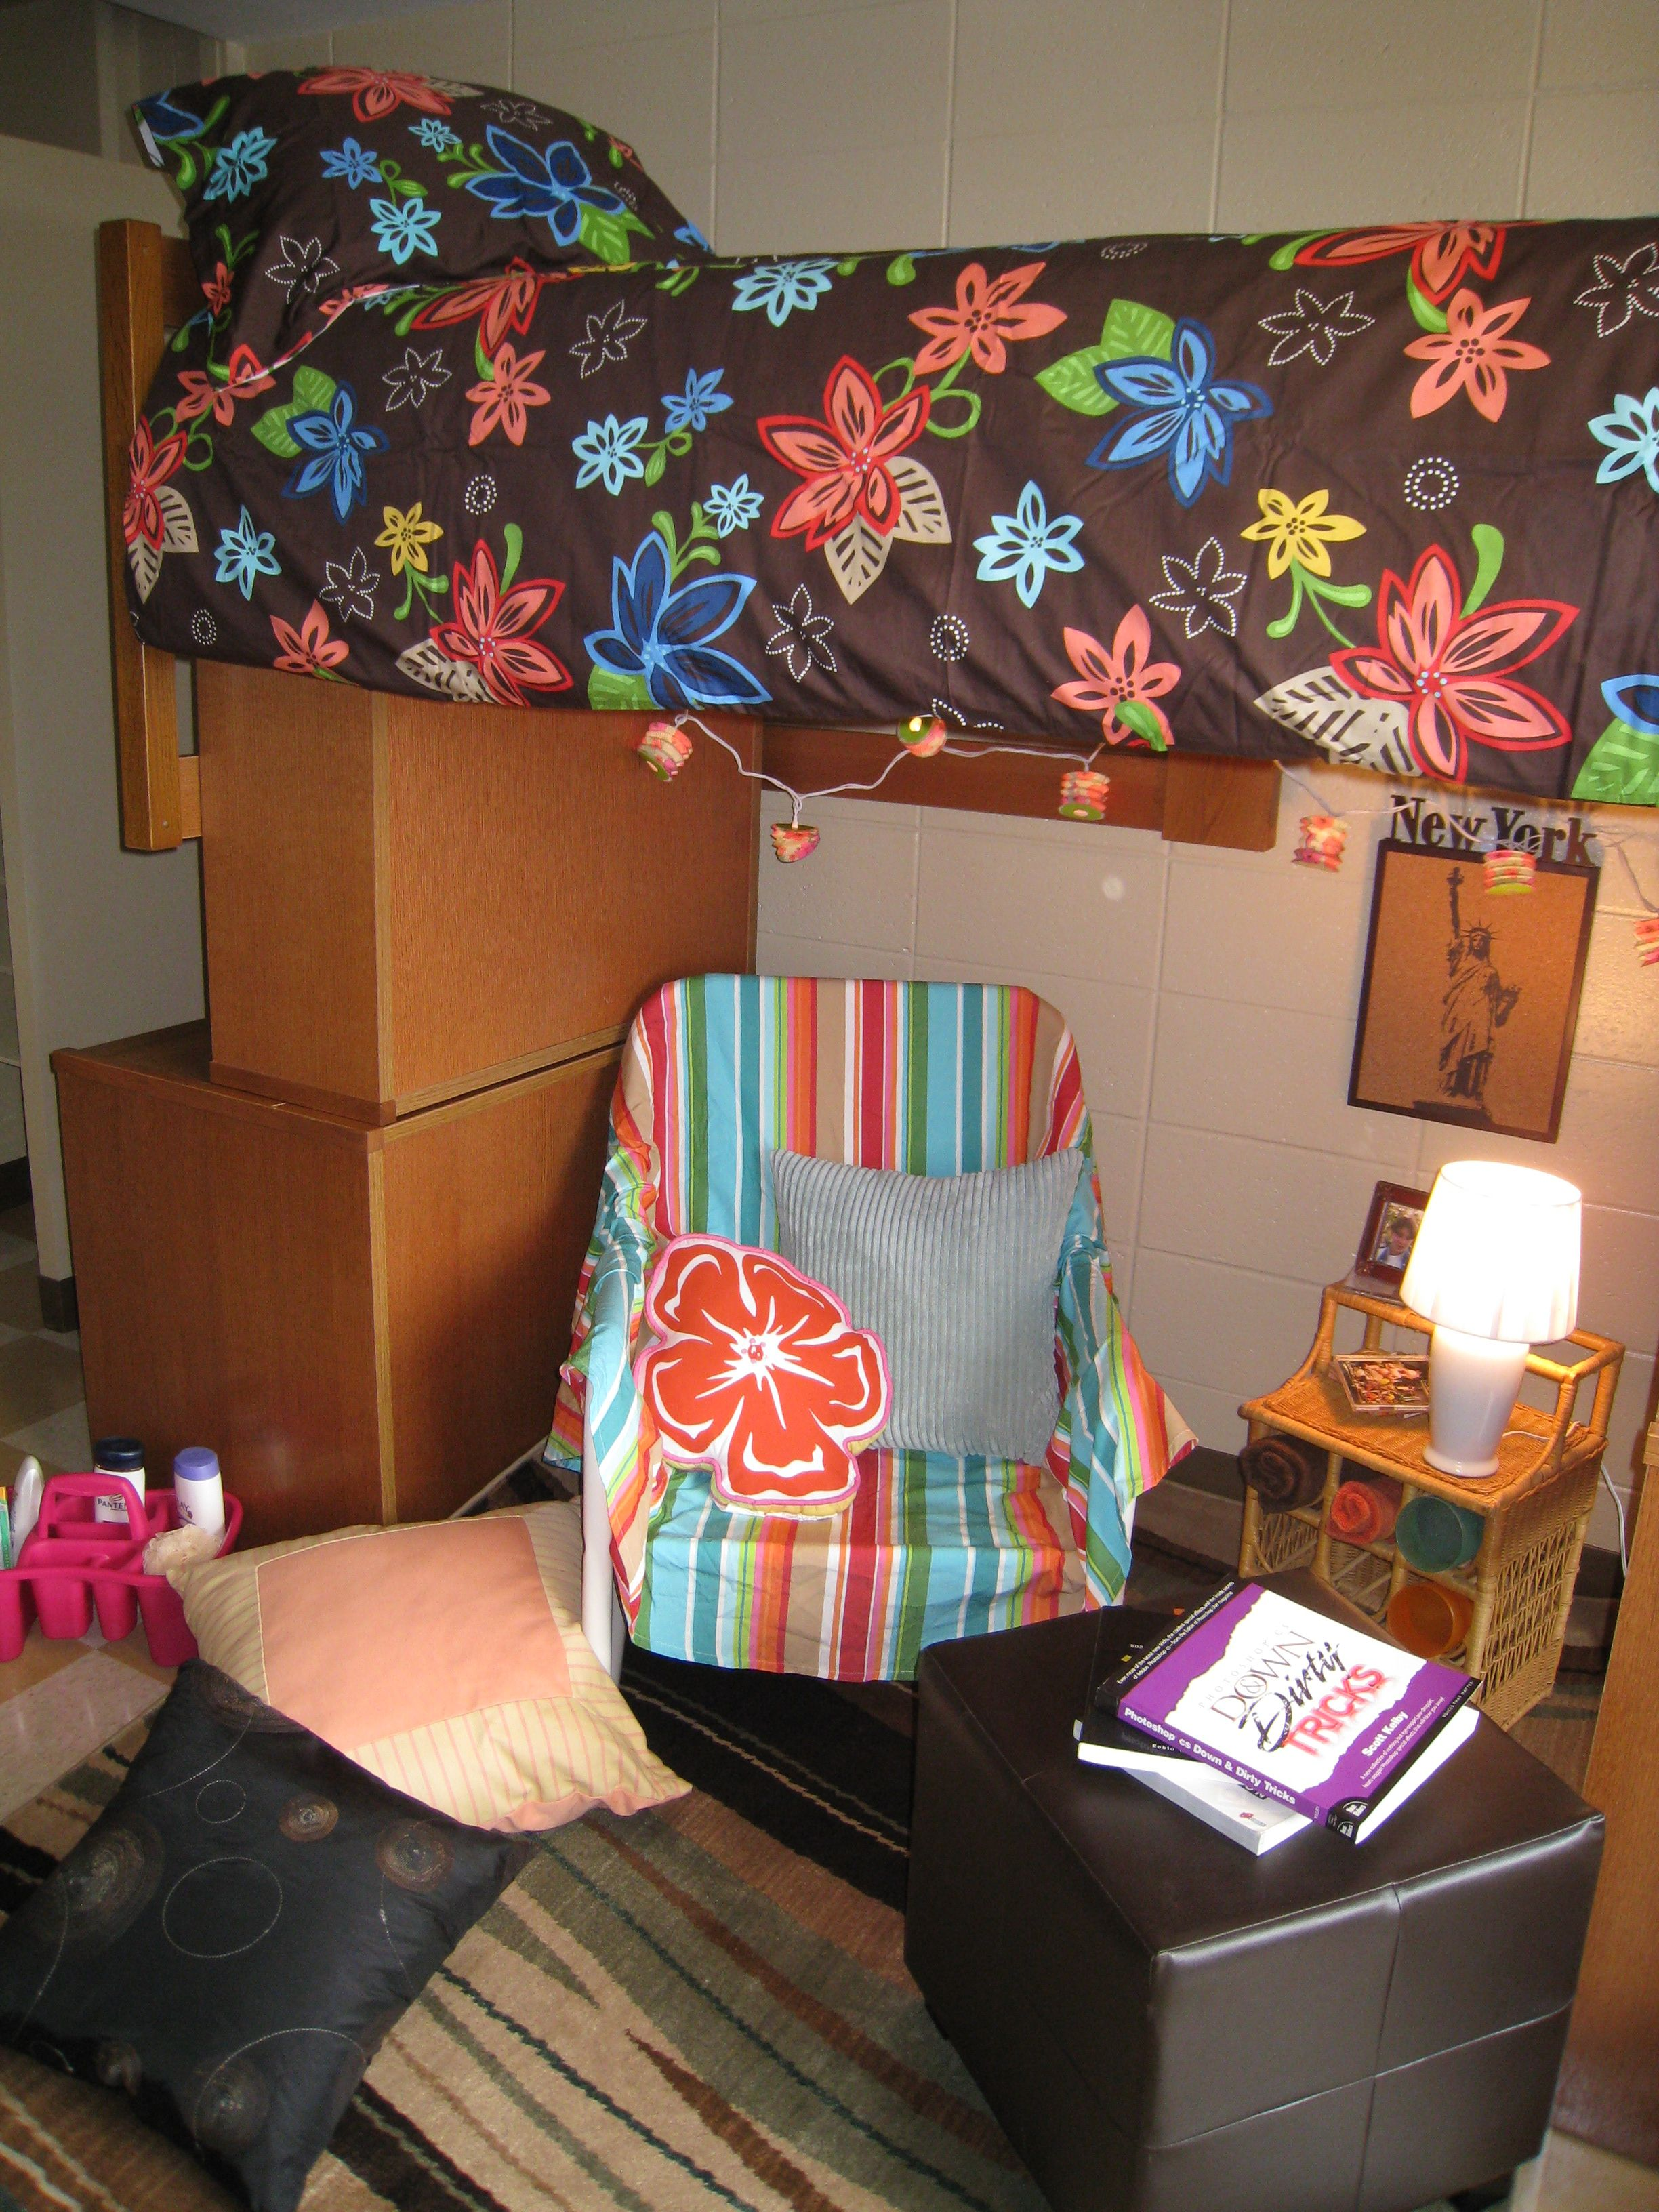 Dorm Room Furniture: Great Dorm Room Using The Same Furniture That We Have At